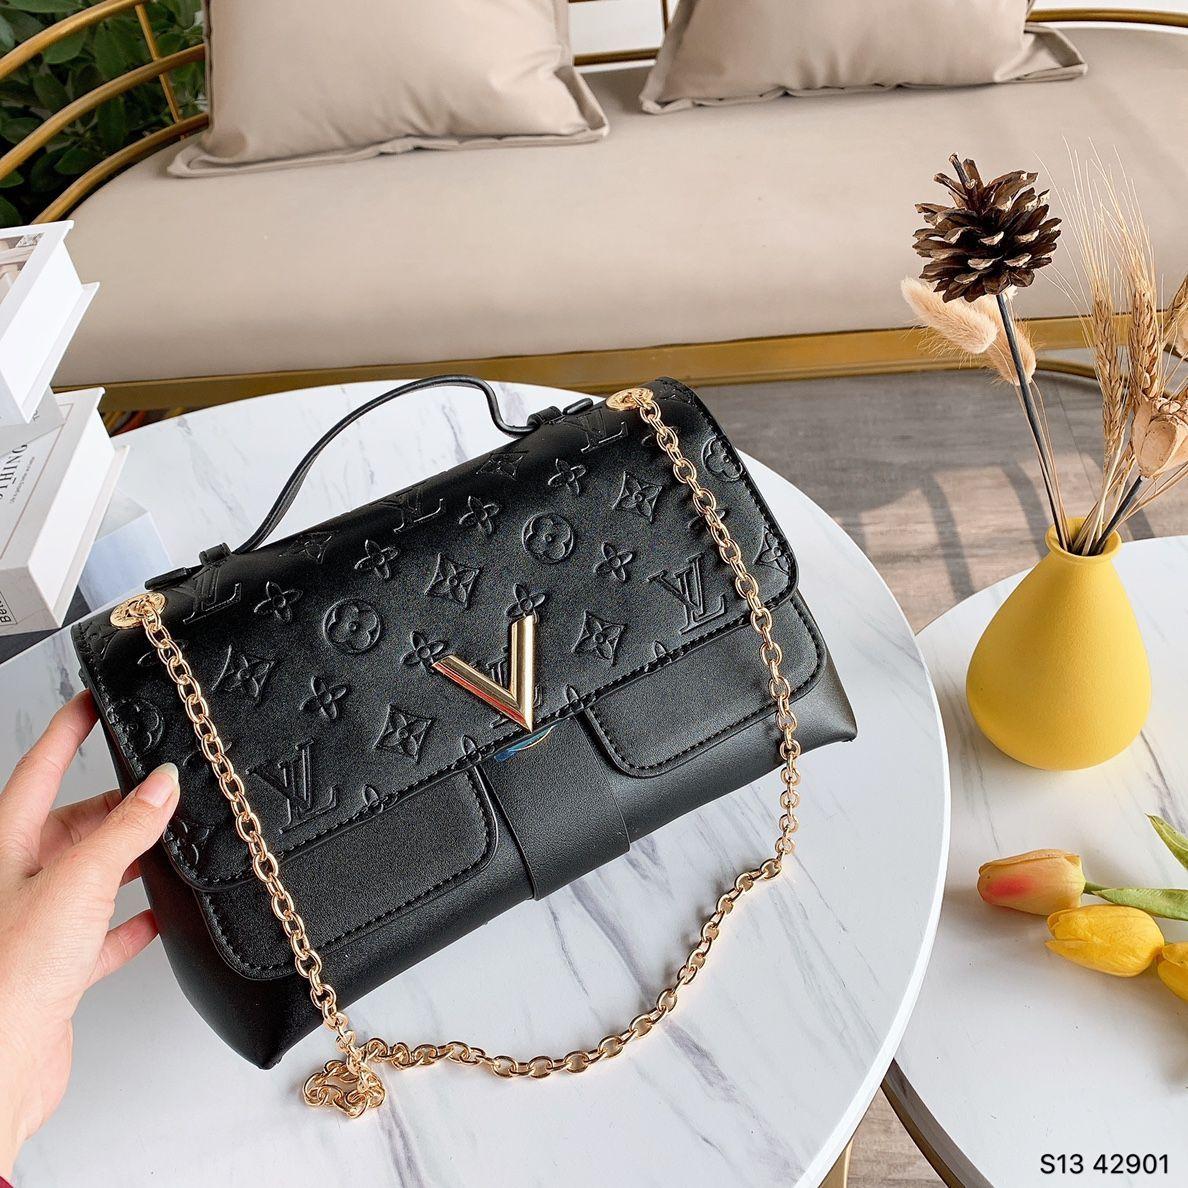 Fashion Women Handbags New Female Bag High Quality PU Leather Simple Letter Wide Strap Design Portable Shoulder Bags Women 544 1